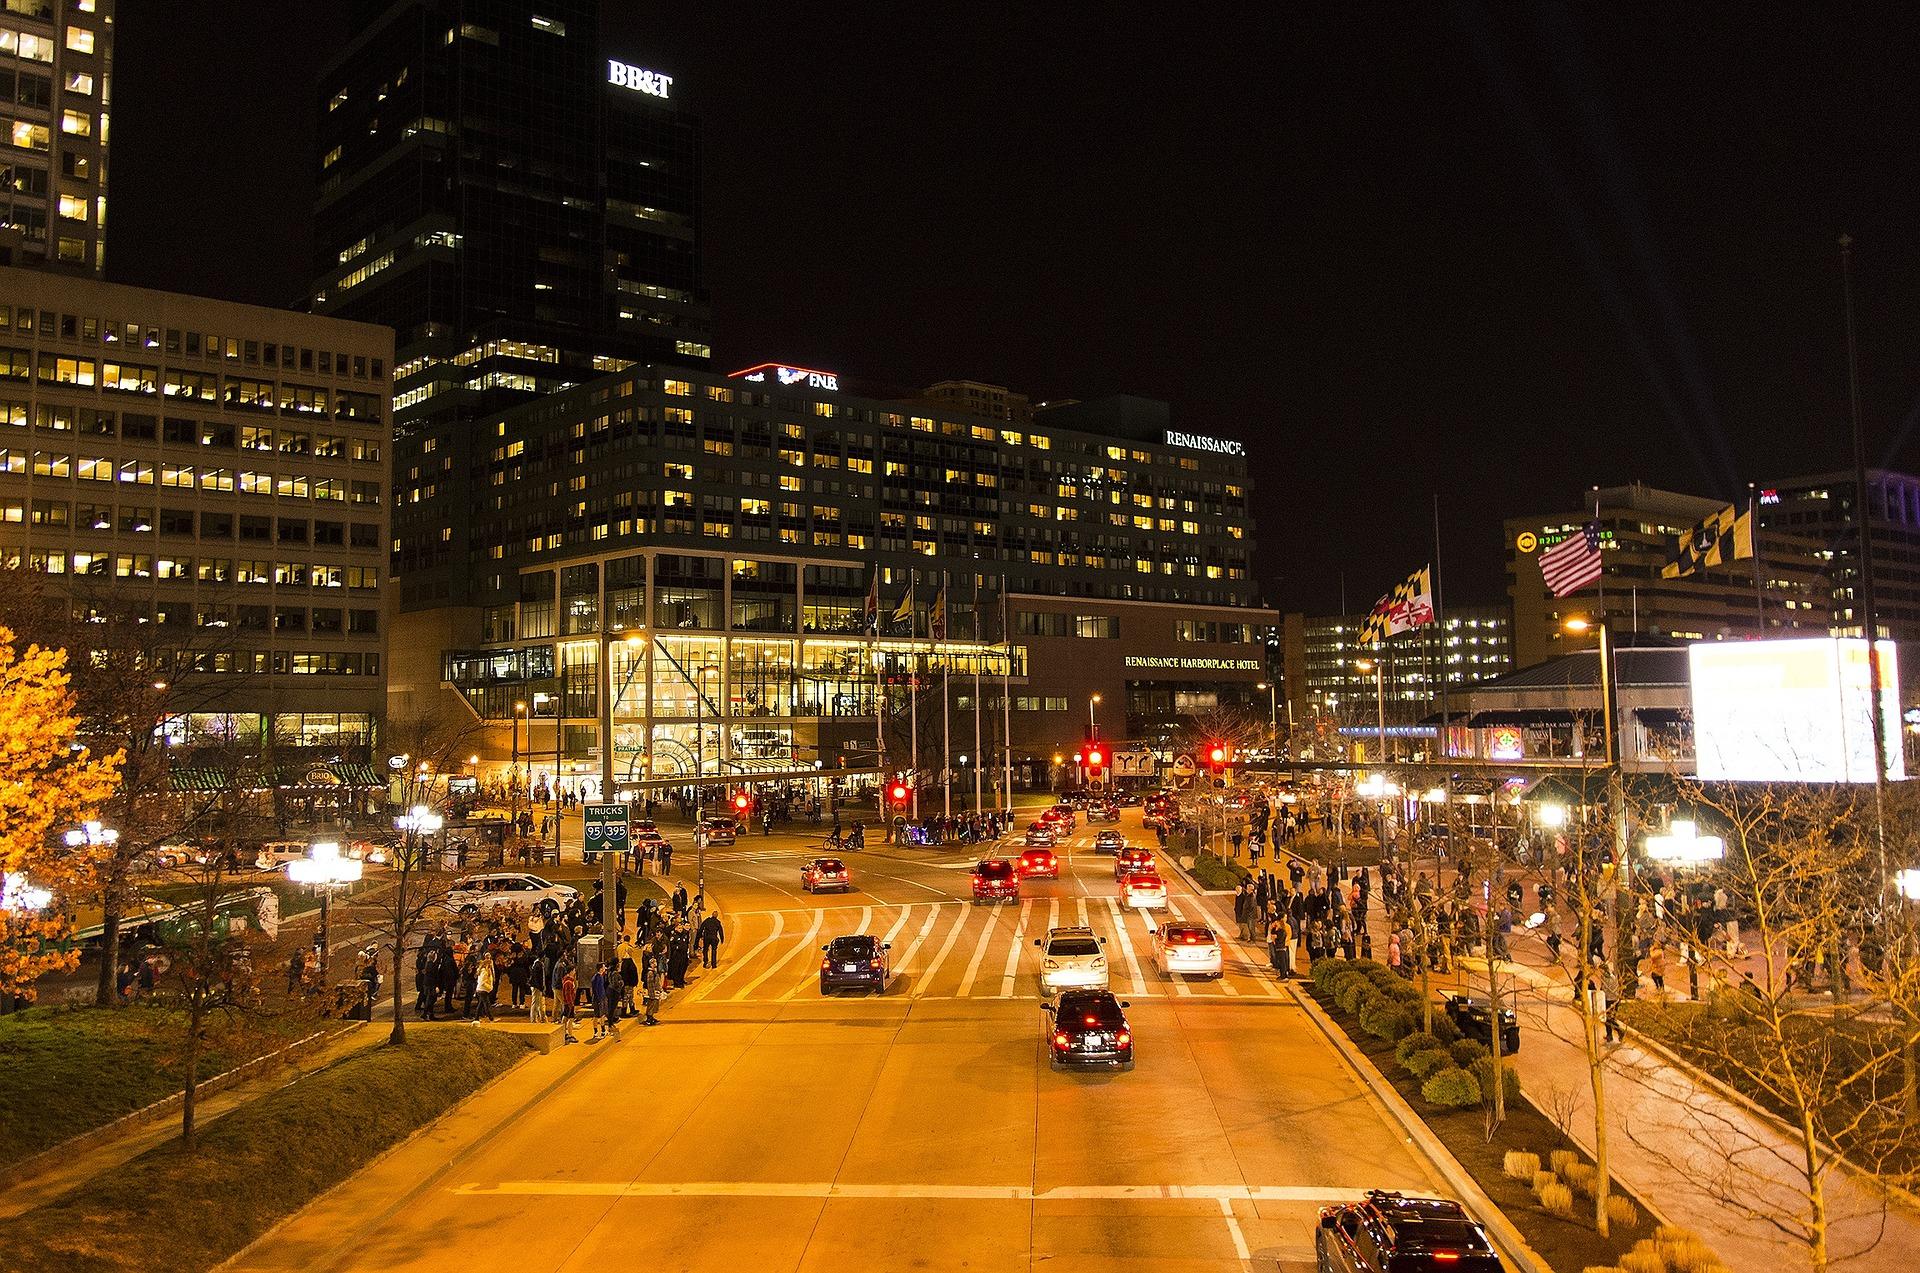 Pratt and Light Streets